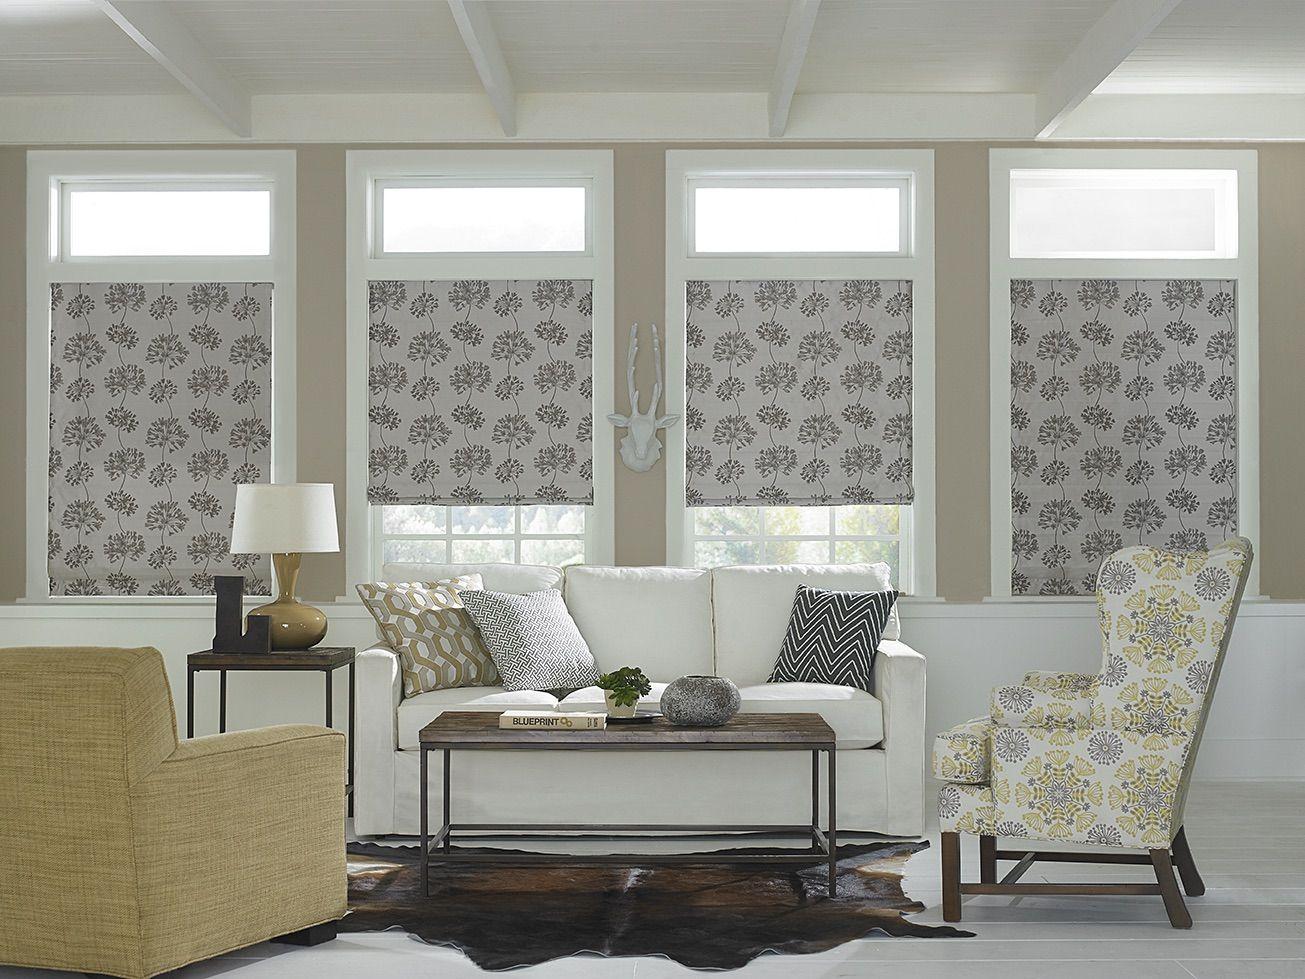 Kitchen window no trim  essence is a custom fabric shade program designed to offer a